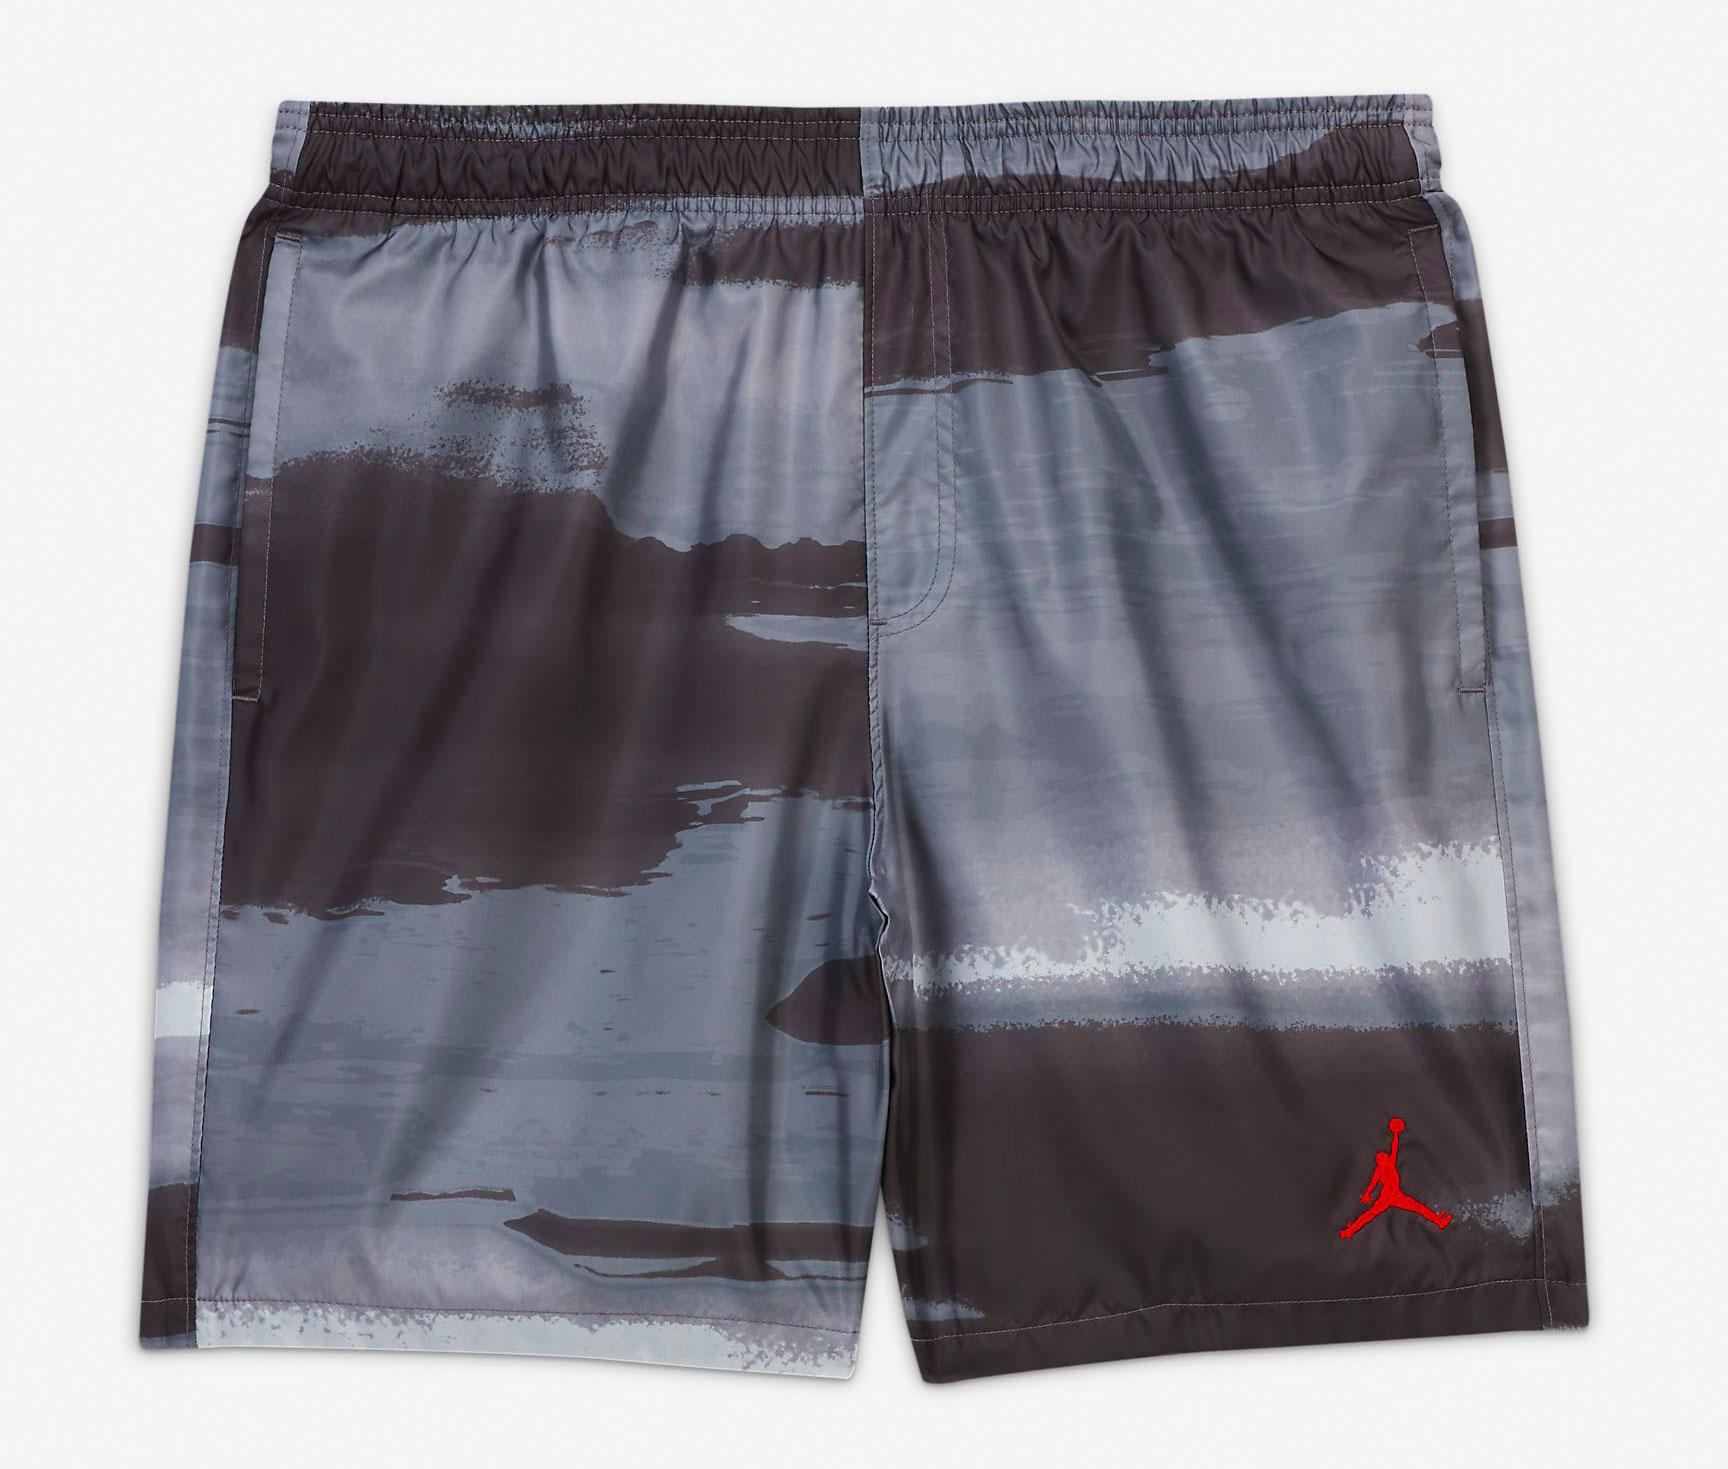 air-jordan-11-low-ie-black-cement-shorts-match-1